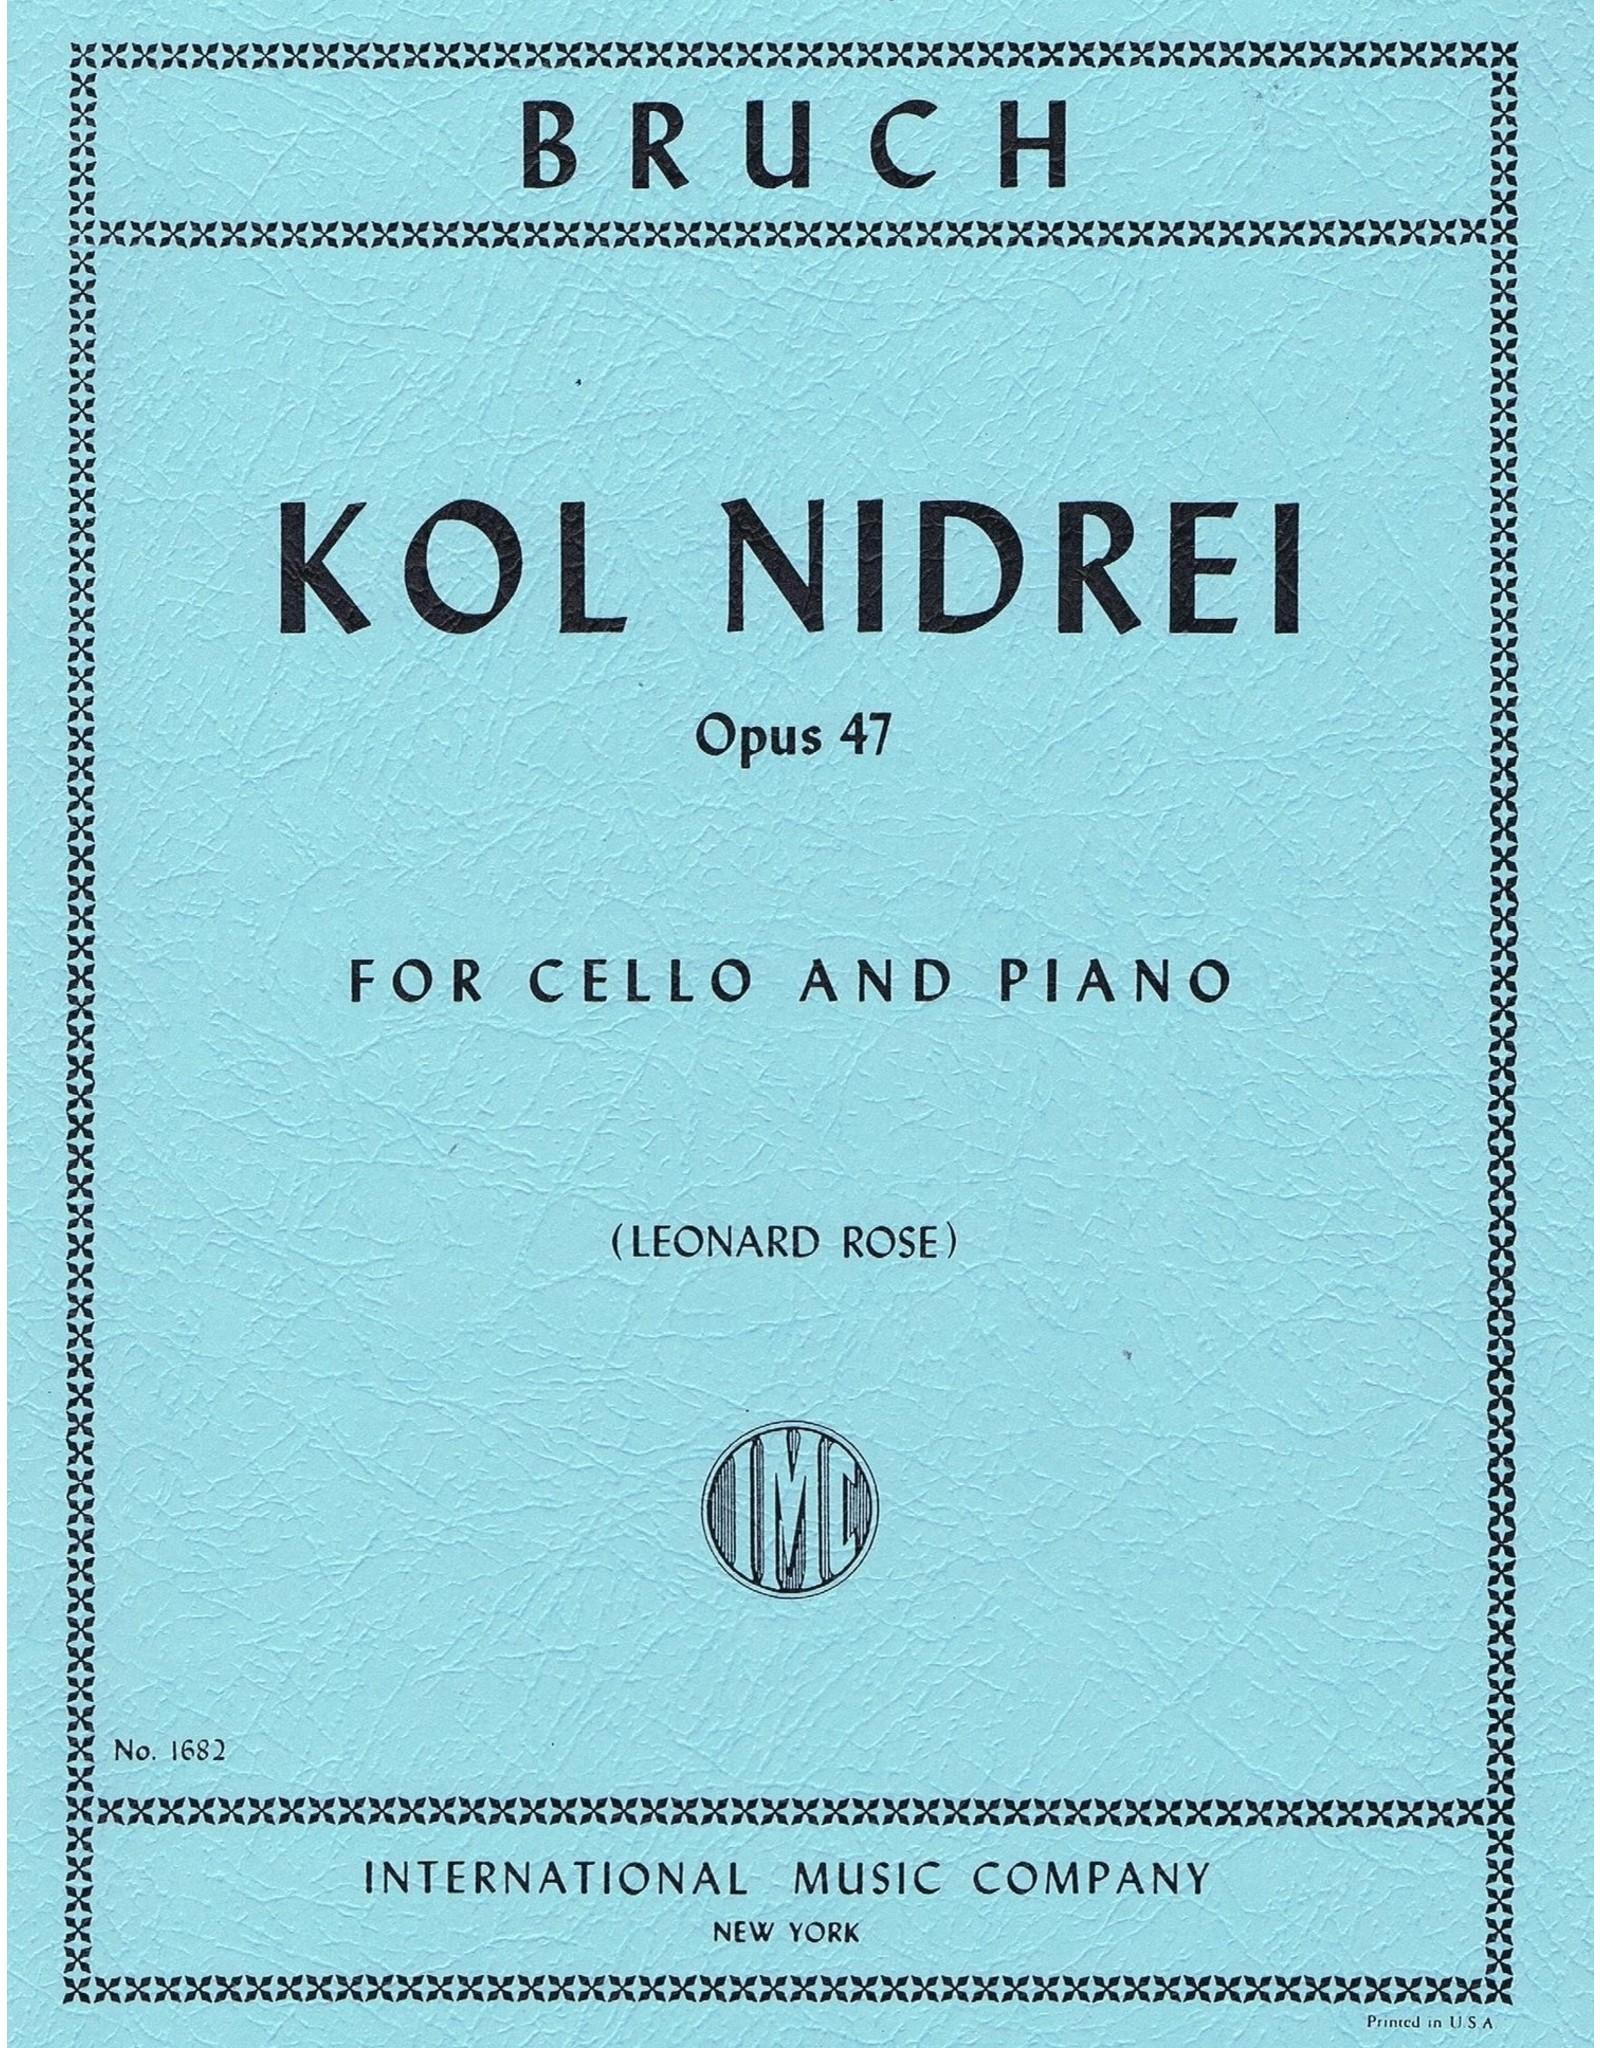 International Bruch Kol Nidrei Op.47 - Cello